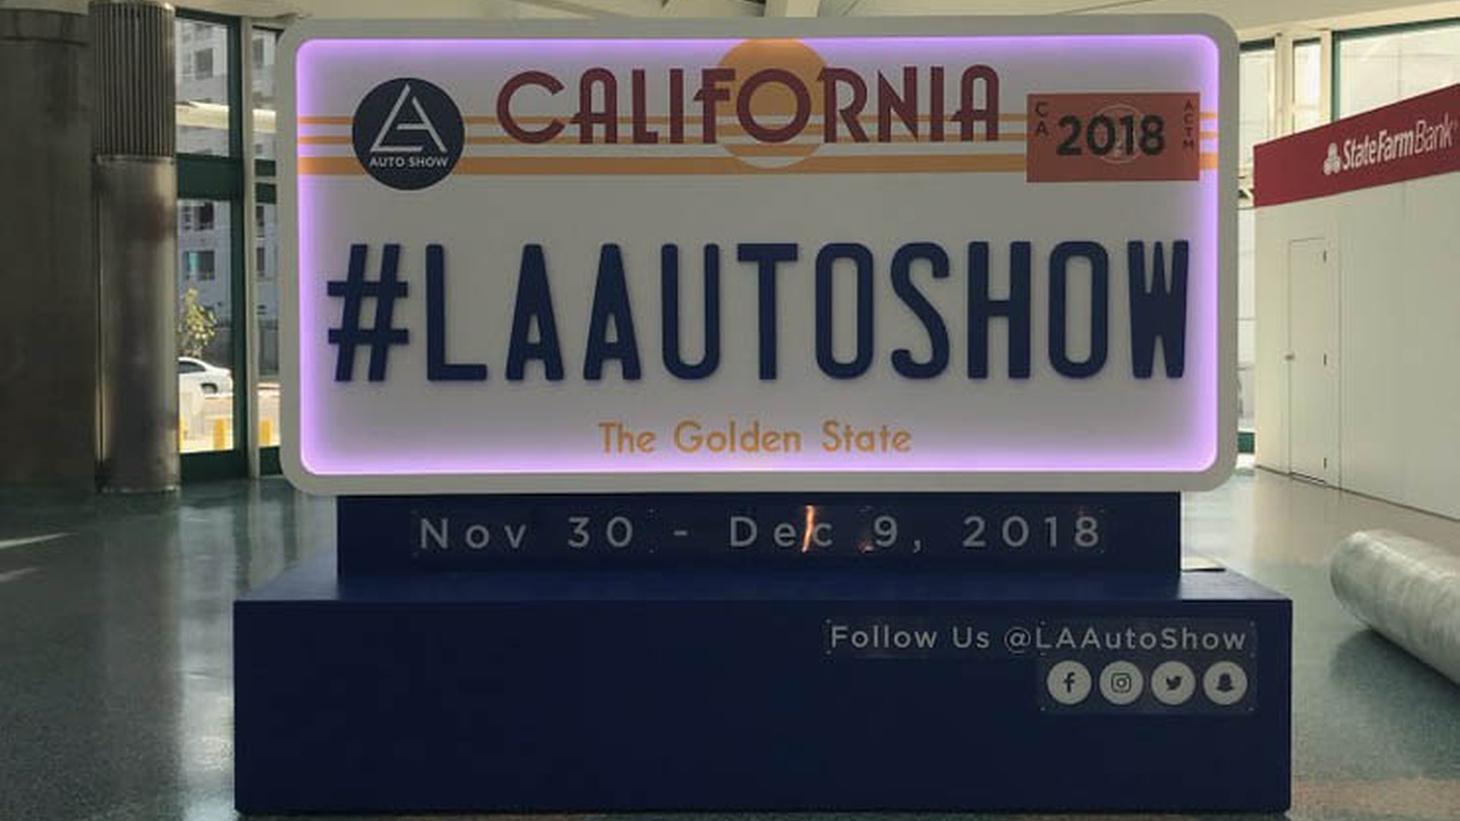 The LA Auto Show runs through Sunday, December 9th.